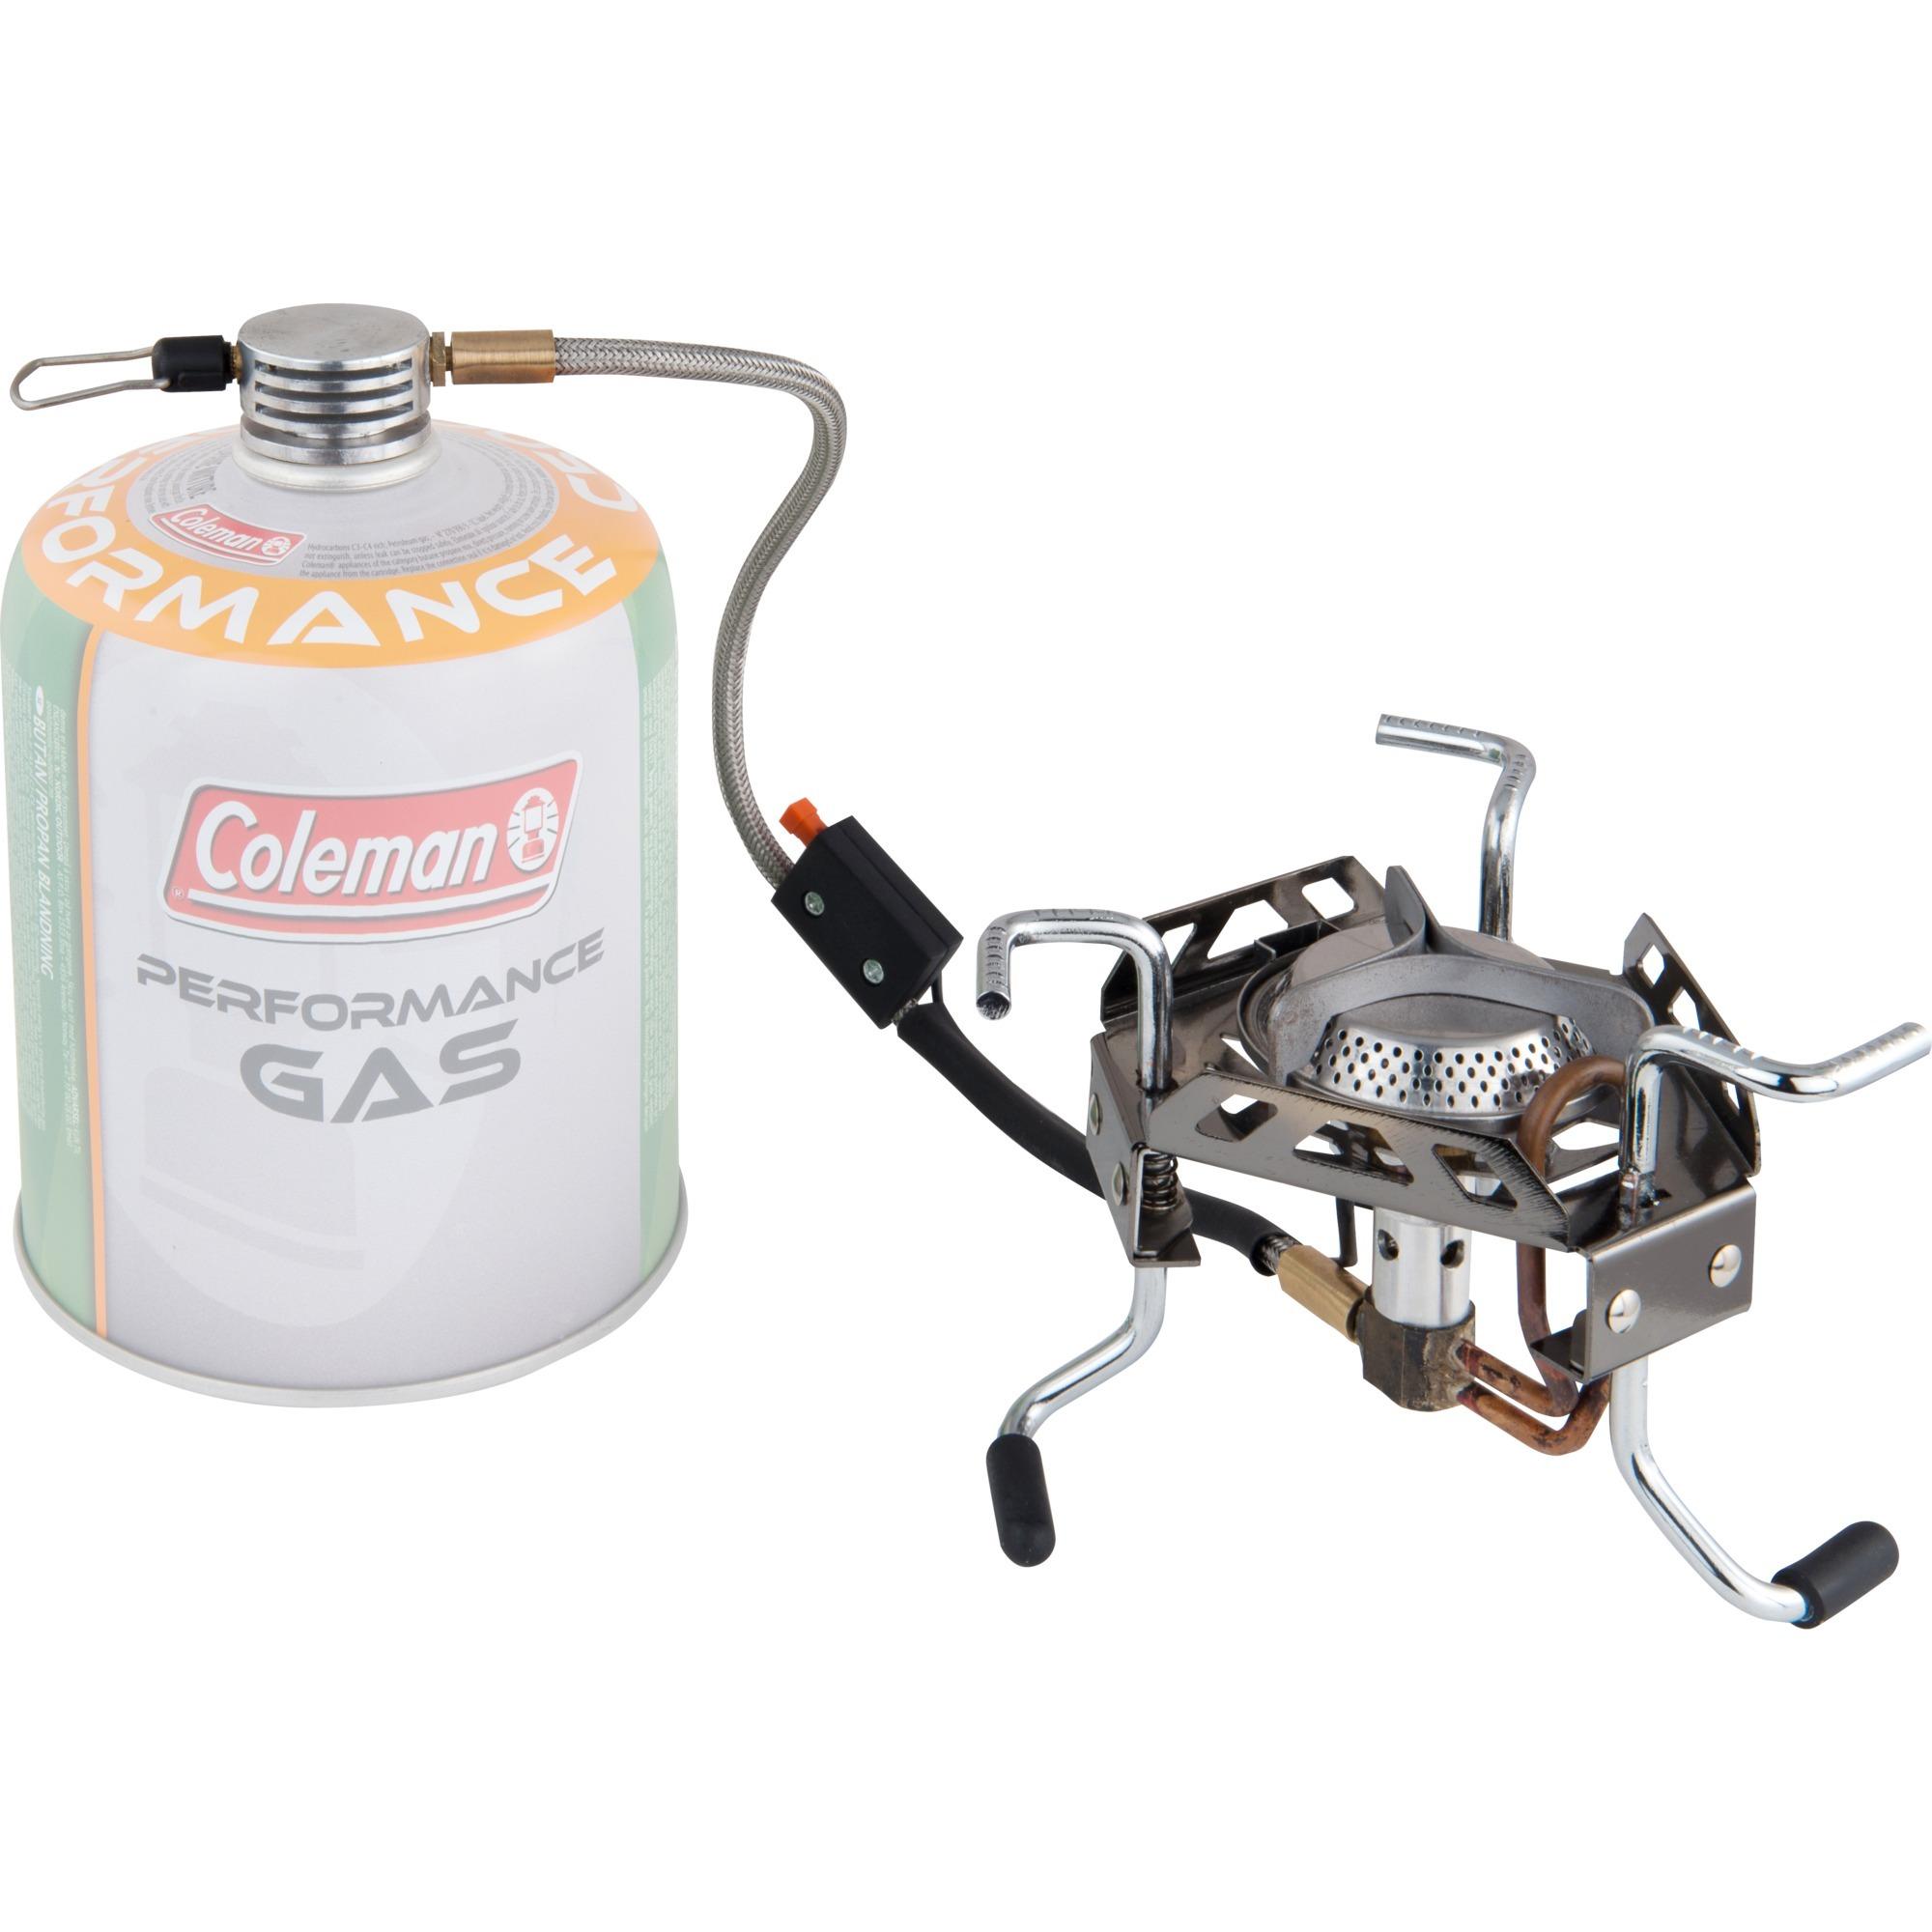 Hornillo a gas butano glp 1 9kw placa precios y ofertas teka - Cocina de gas precios ...